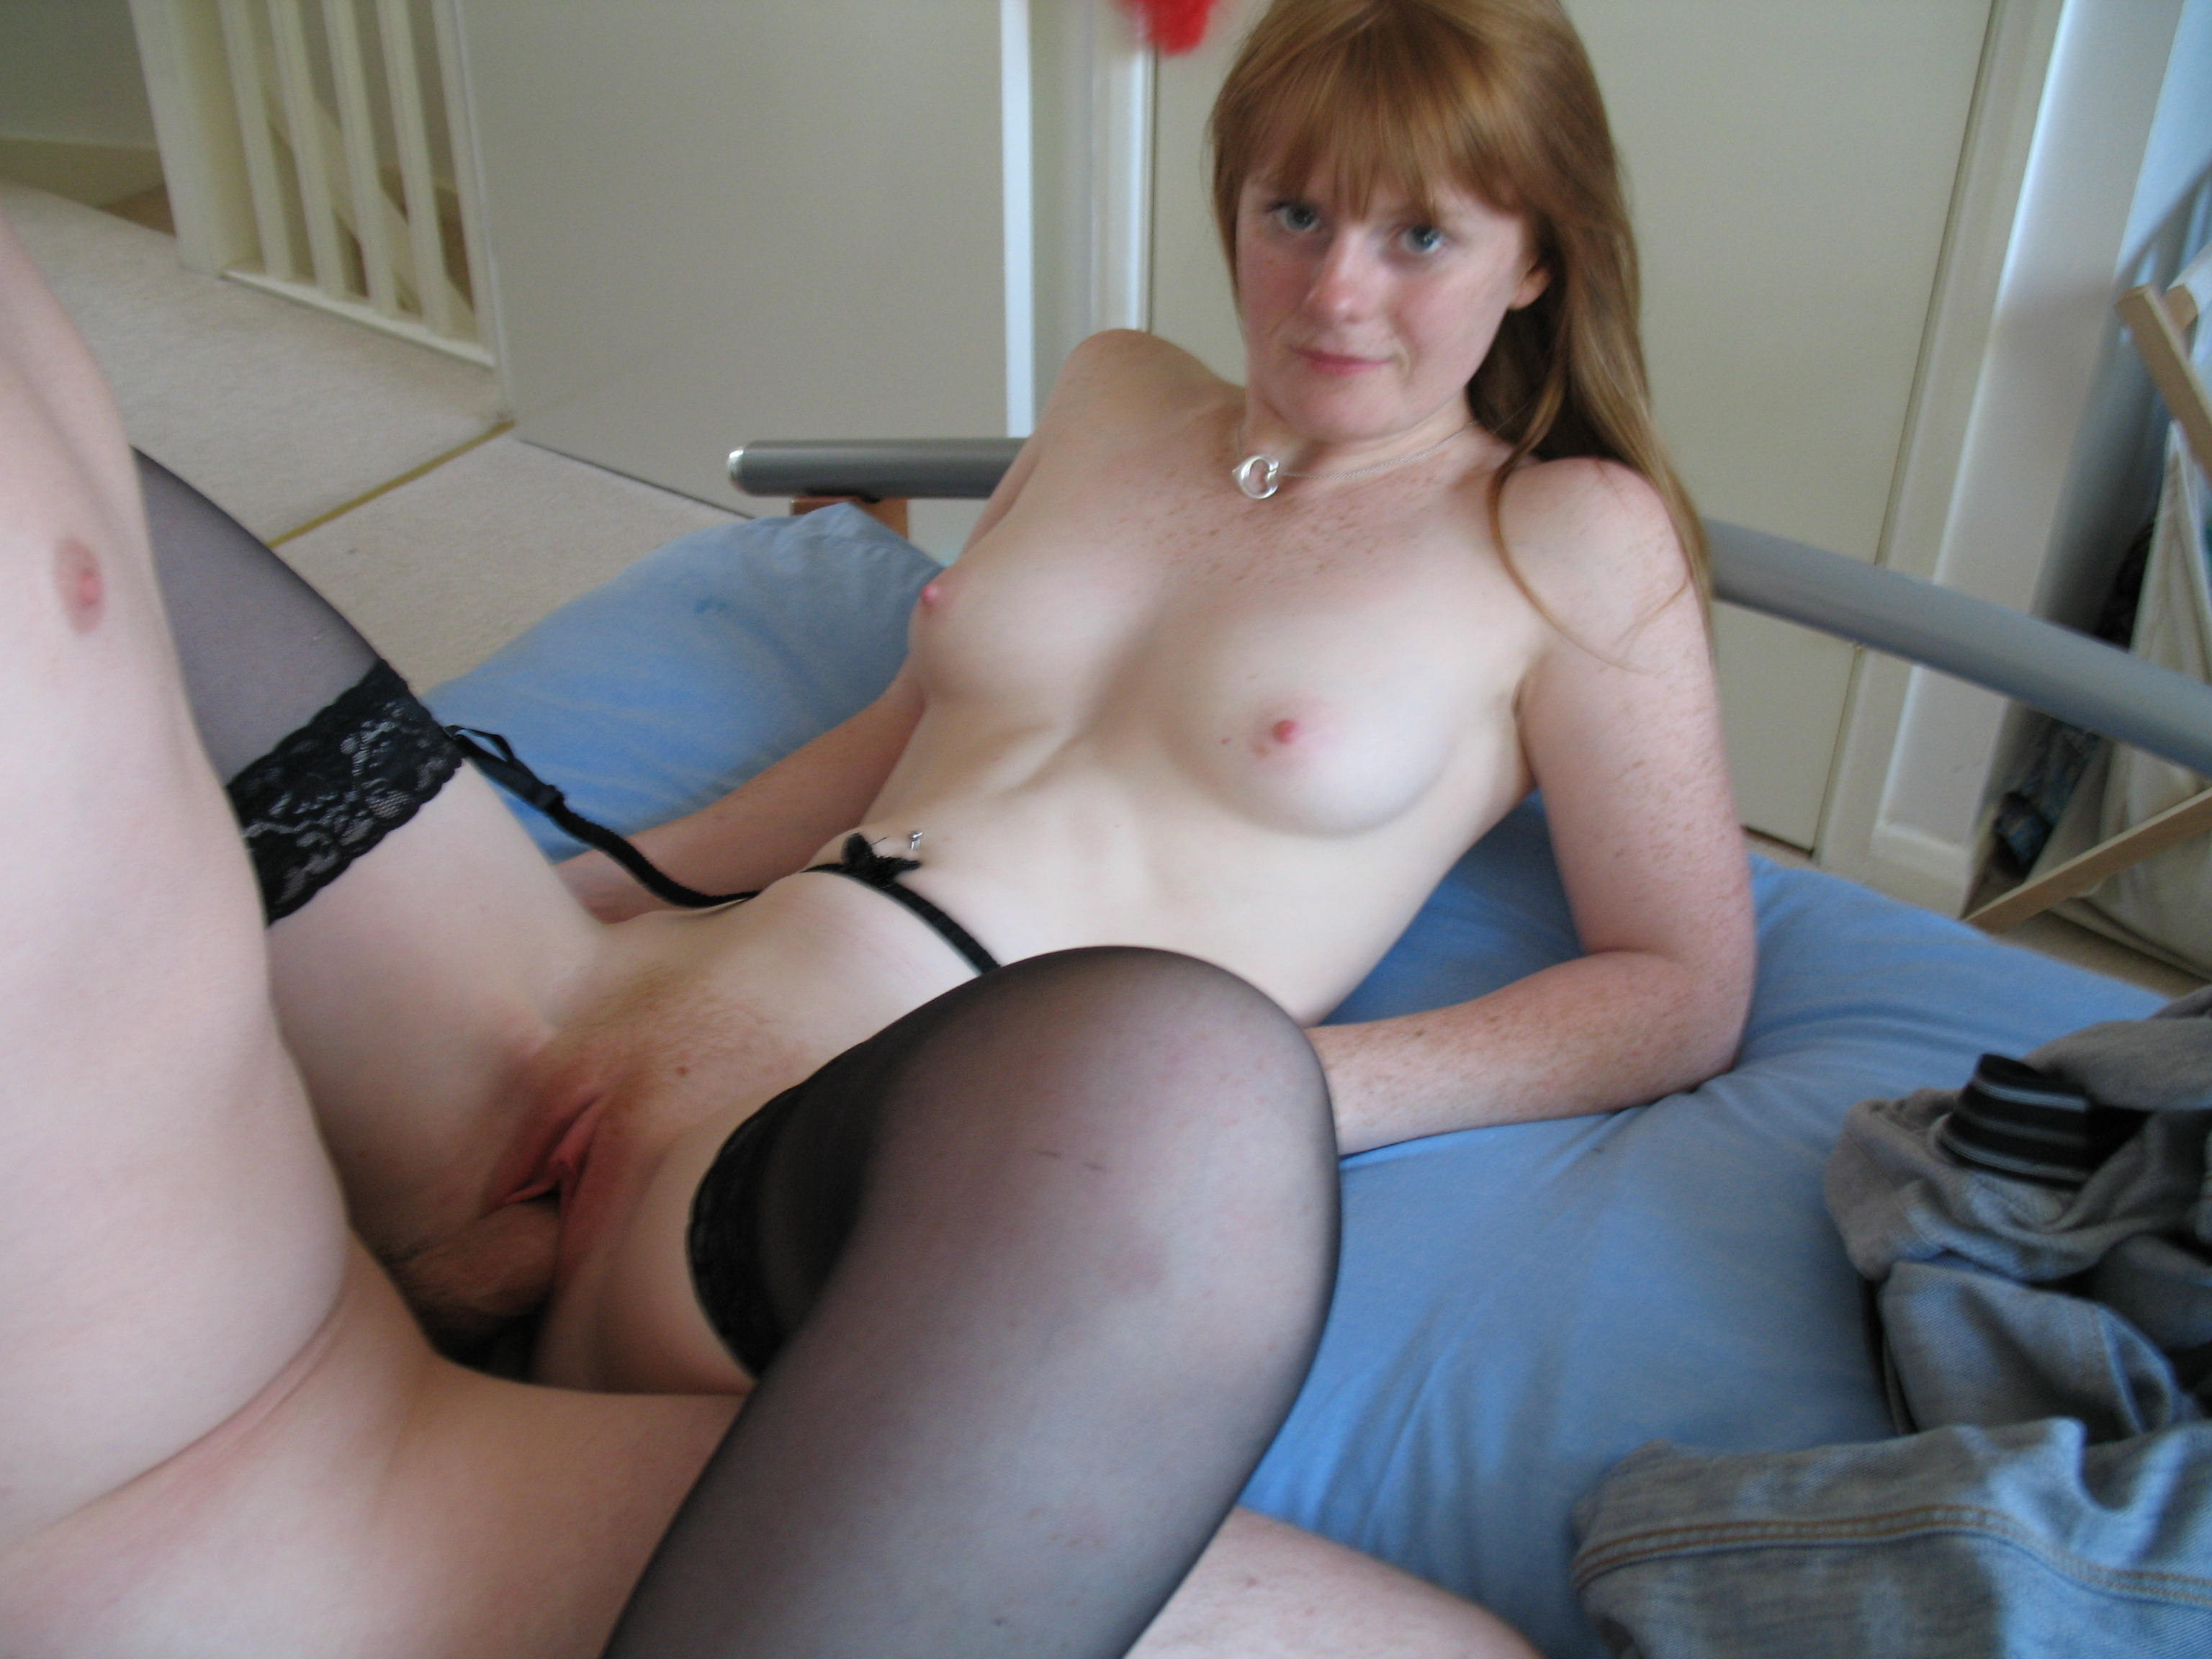 Просто фото домашнего секса - компиляция 24